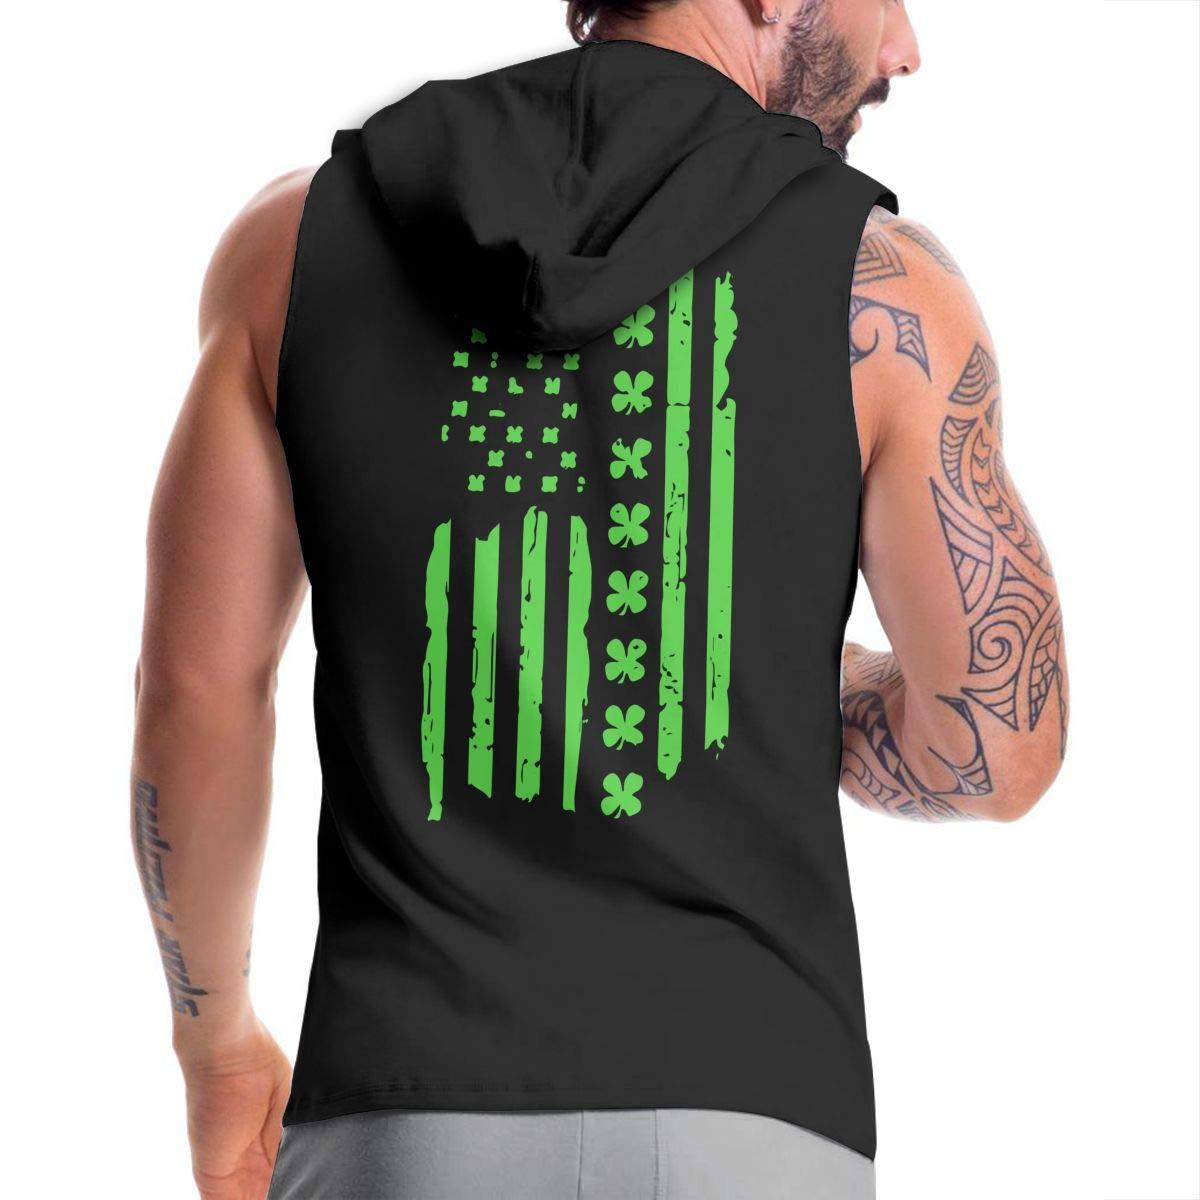 Patricks Day Irish American USA Flag Mens Sleeveless Full Zip Hooded Sweater Slim Fit Tank Top BB/&YYY St